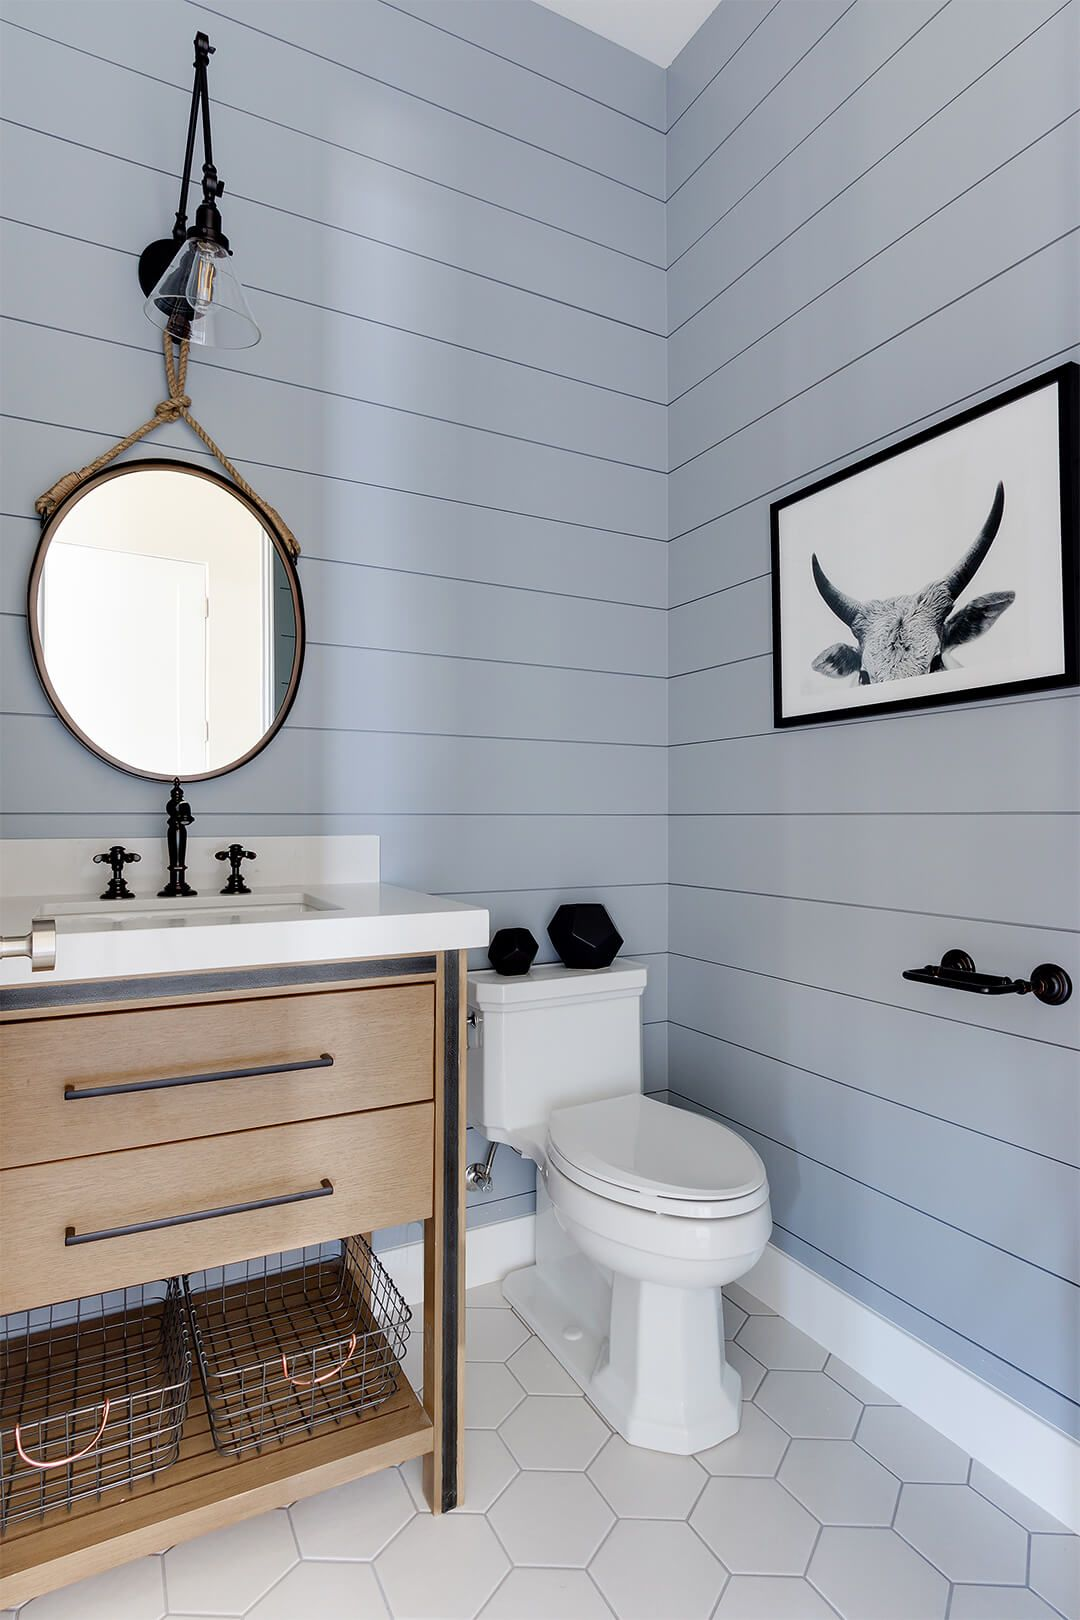 25 Best Bathroom Paint Colors Favorite In 2019 The Architecture Designs Shiplap Bathroom Painting Shiplap Blue Bathroom